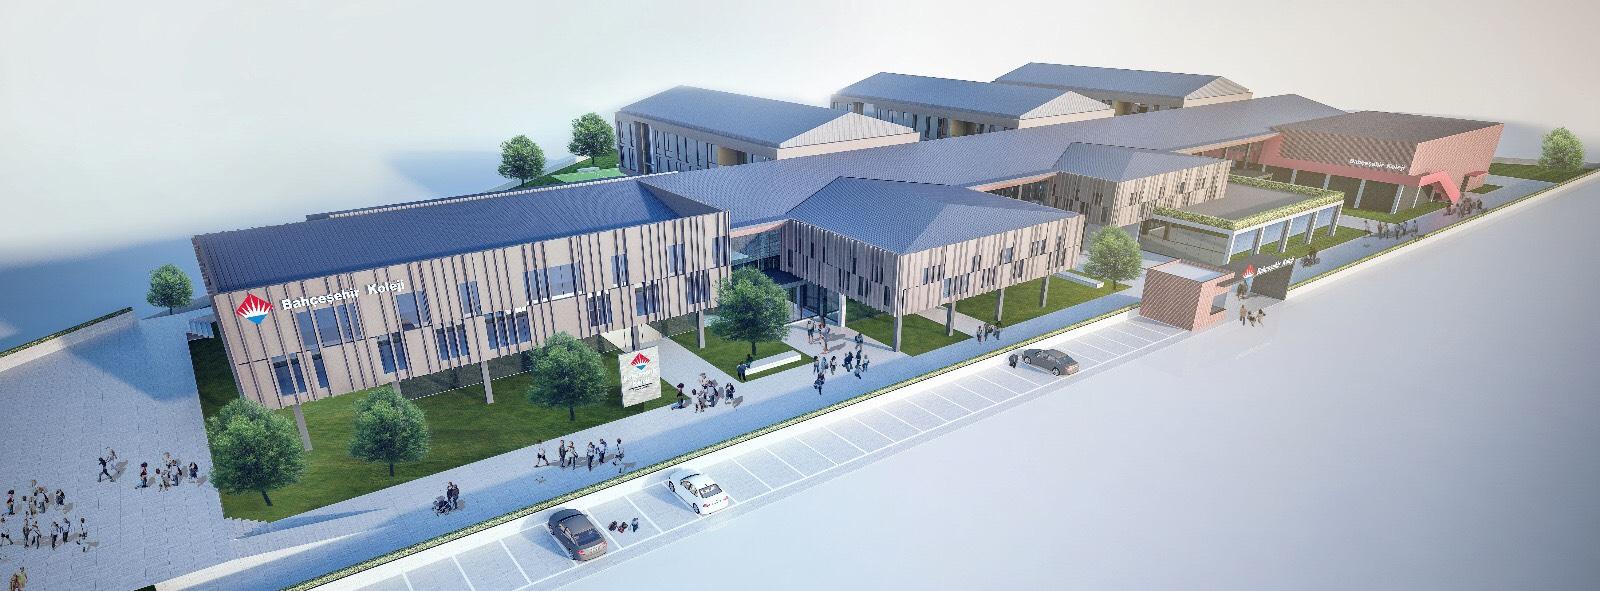 Bahçeşehir Koleji Erzurum Anaokulu